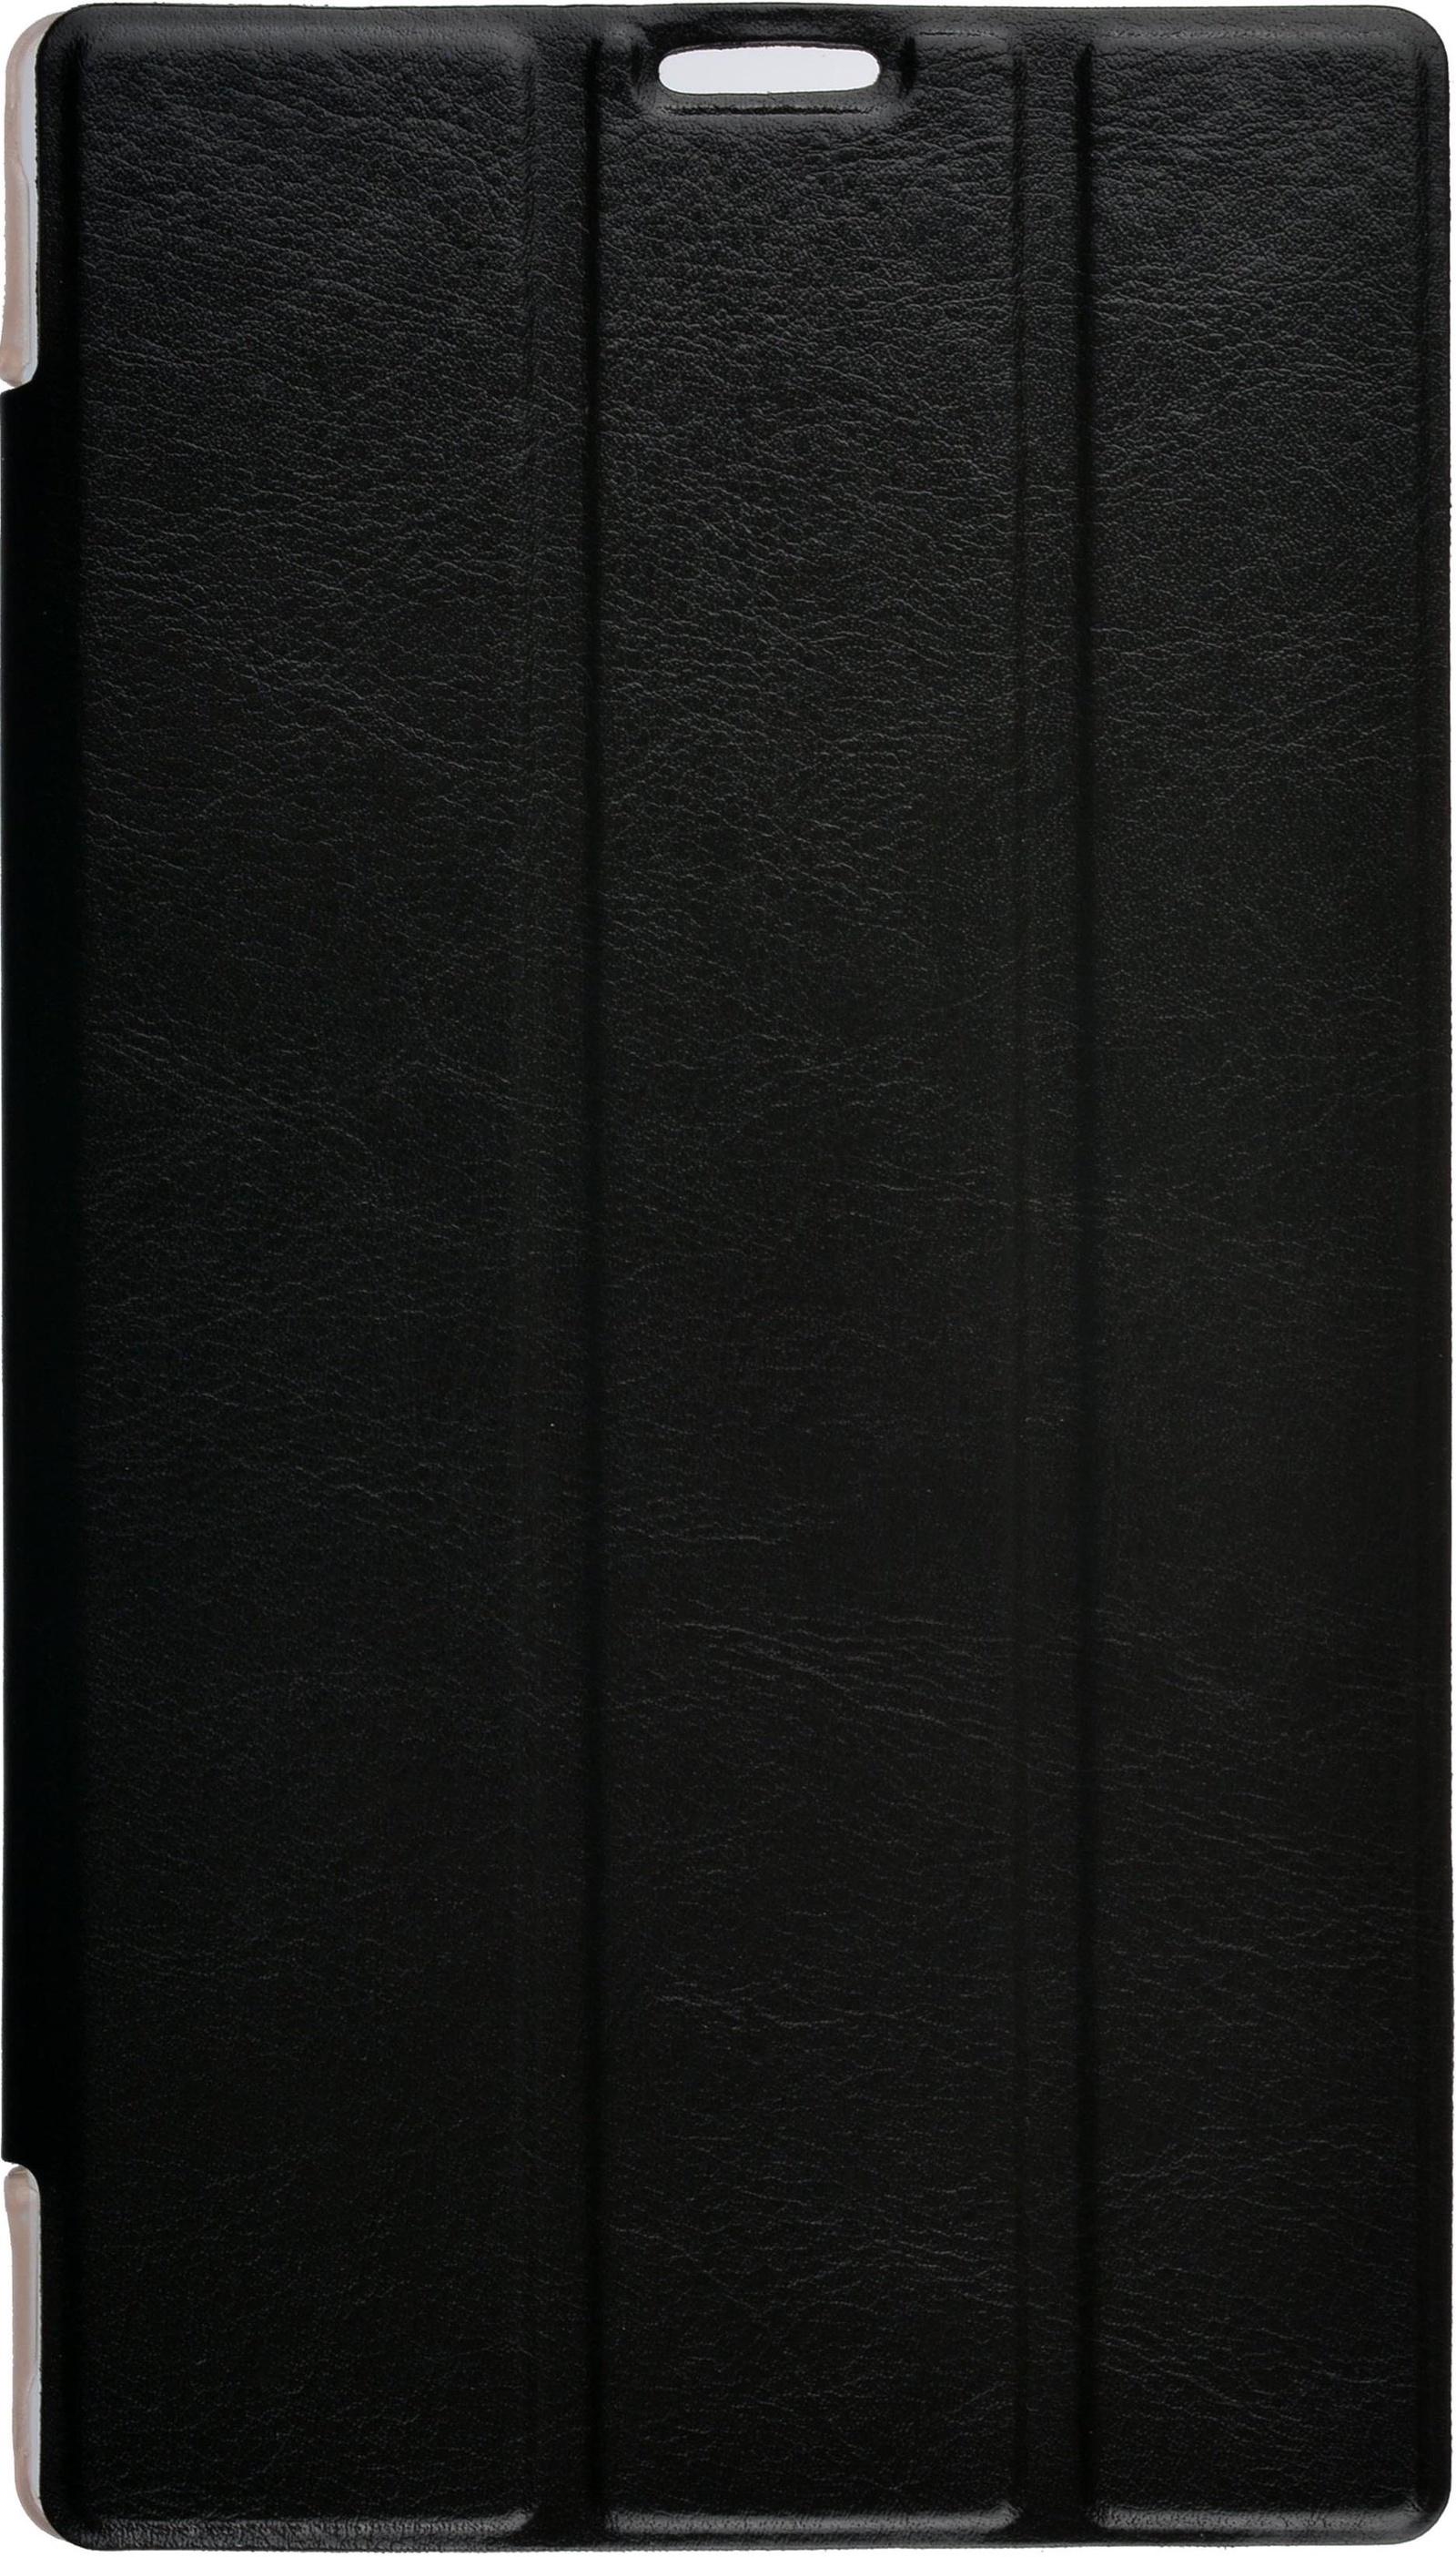 Чехол ProShield Smart для Lenovo Tab 2 A7-30, черный